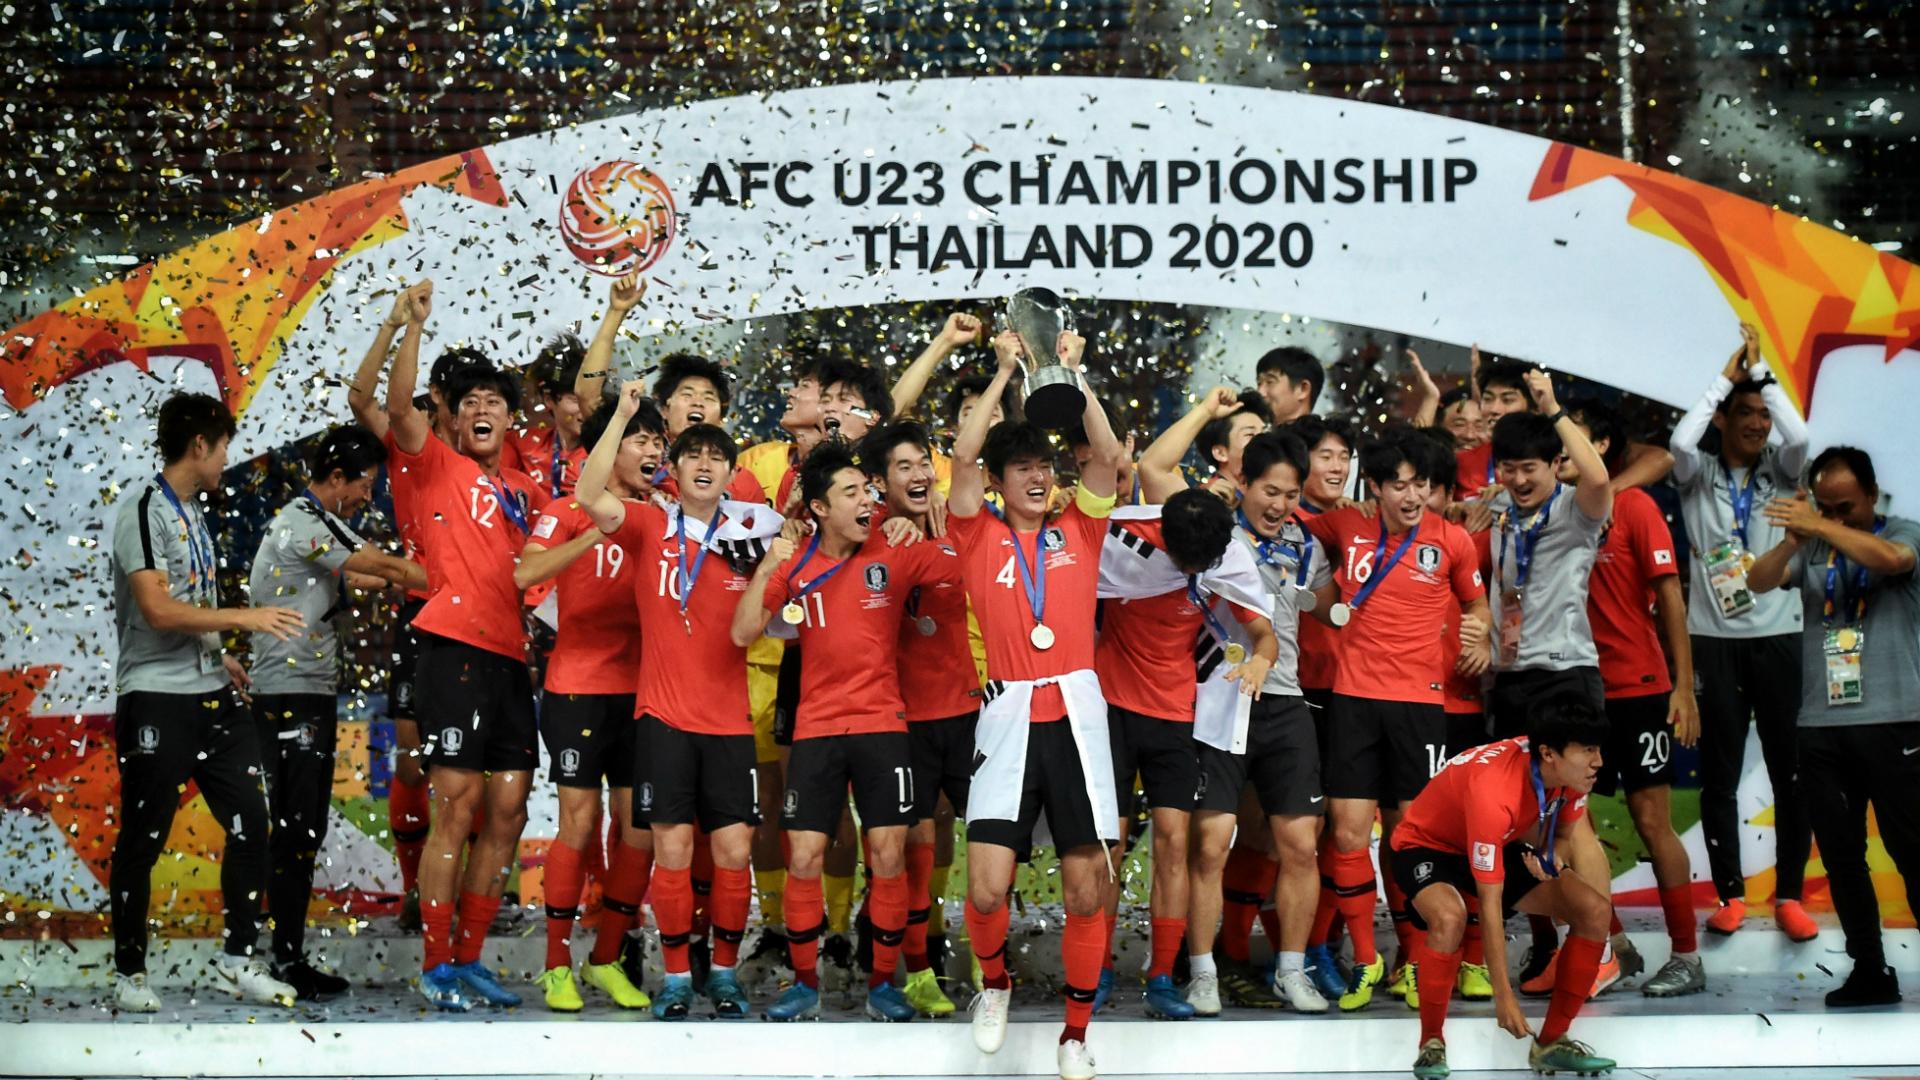 AFC U23 Asian Cup: List of winners (2013-2020)